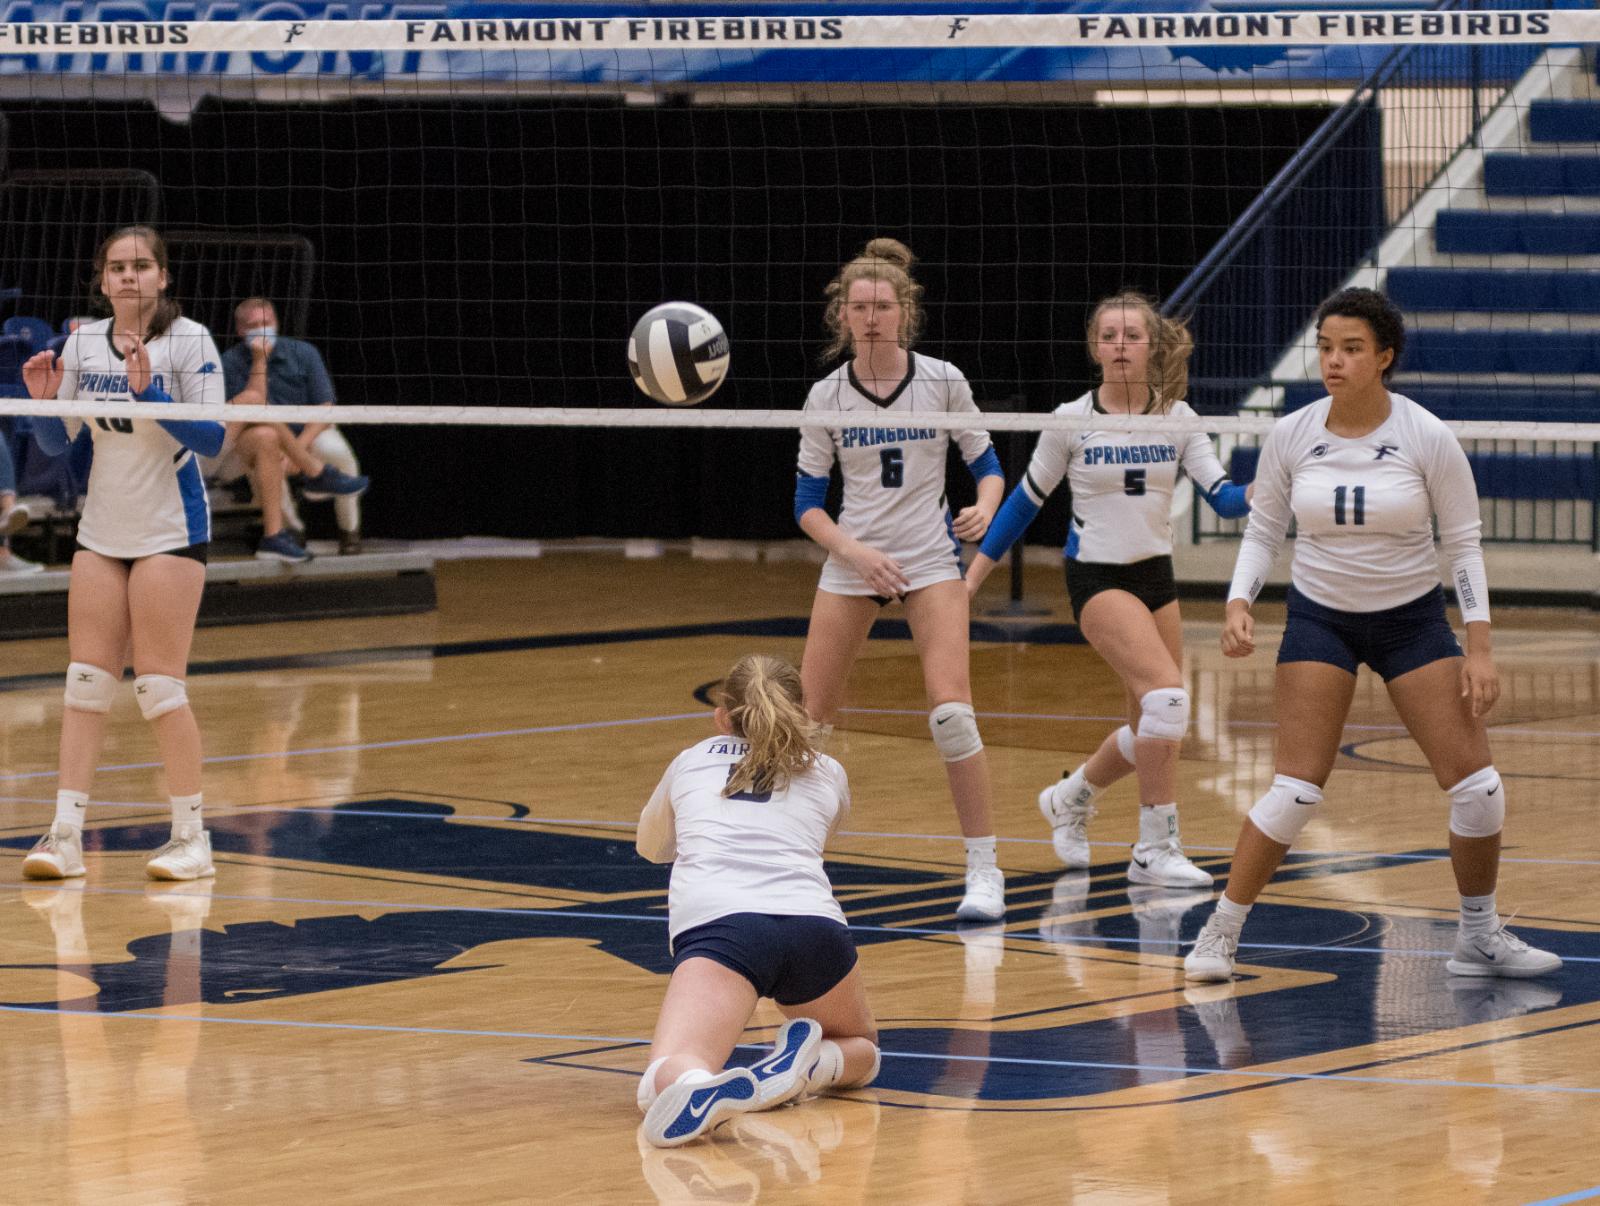 Fairmont Women's JV and Varsity Volleyball vs Springboro 8-25-2020